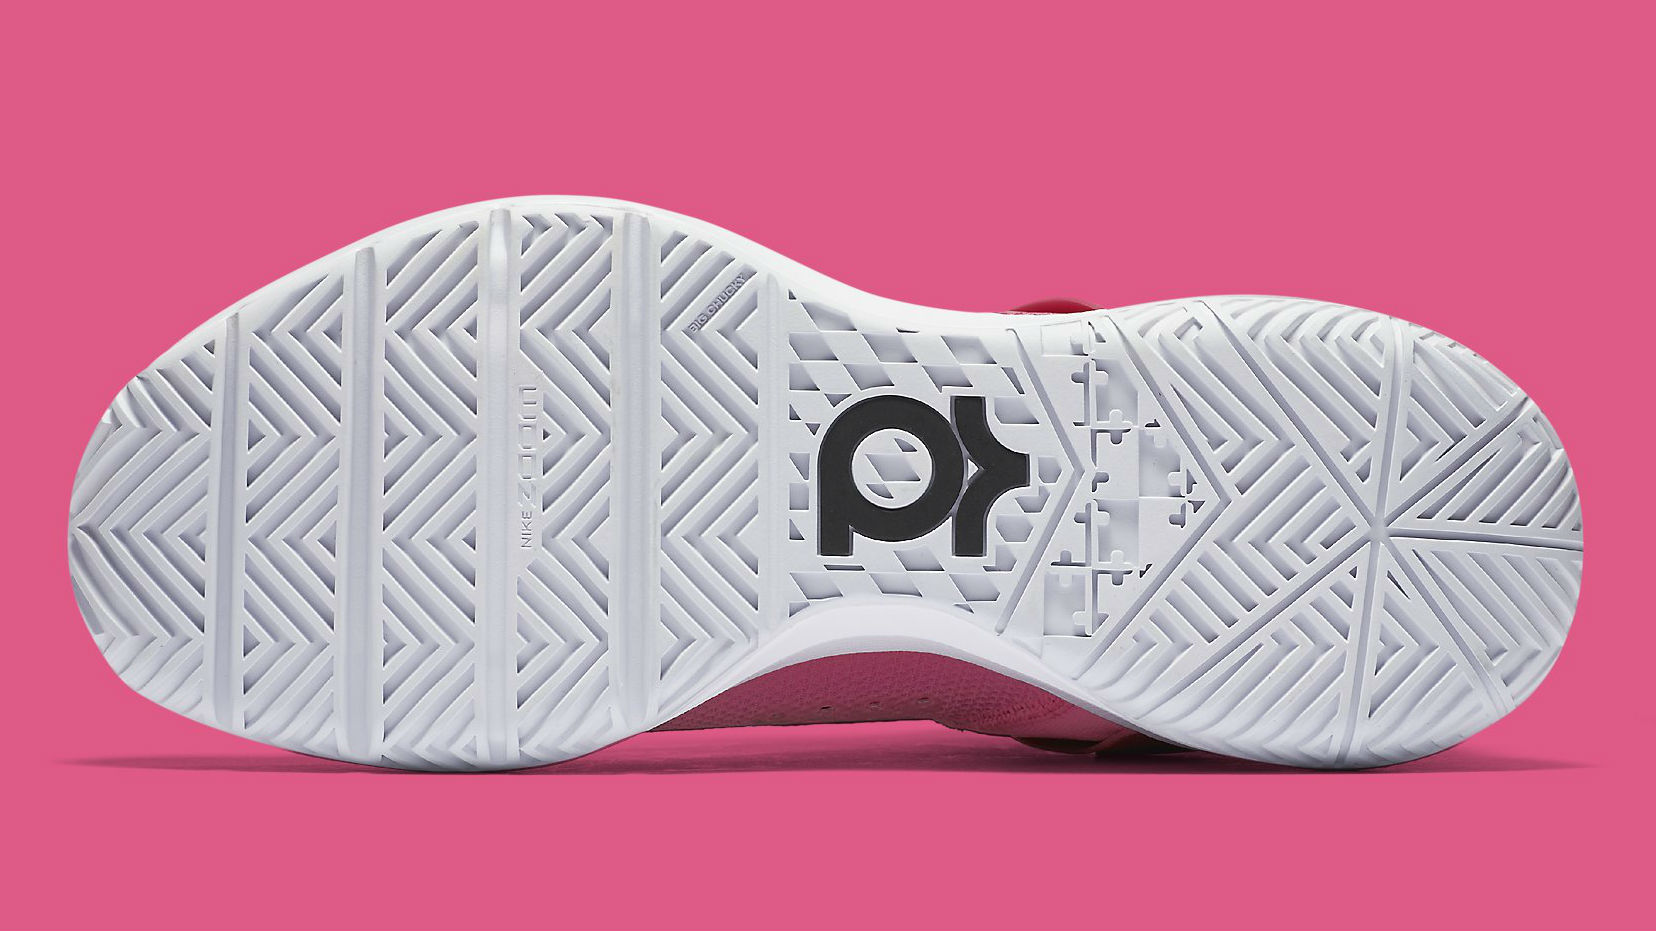 Nike KD Trey 5 IV Think Pink Breast Cancer Kay Yow Sole 844573-606